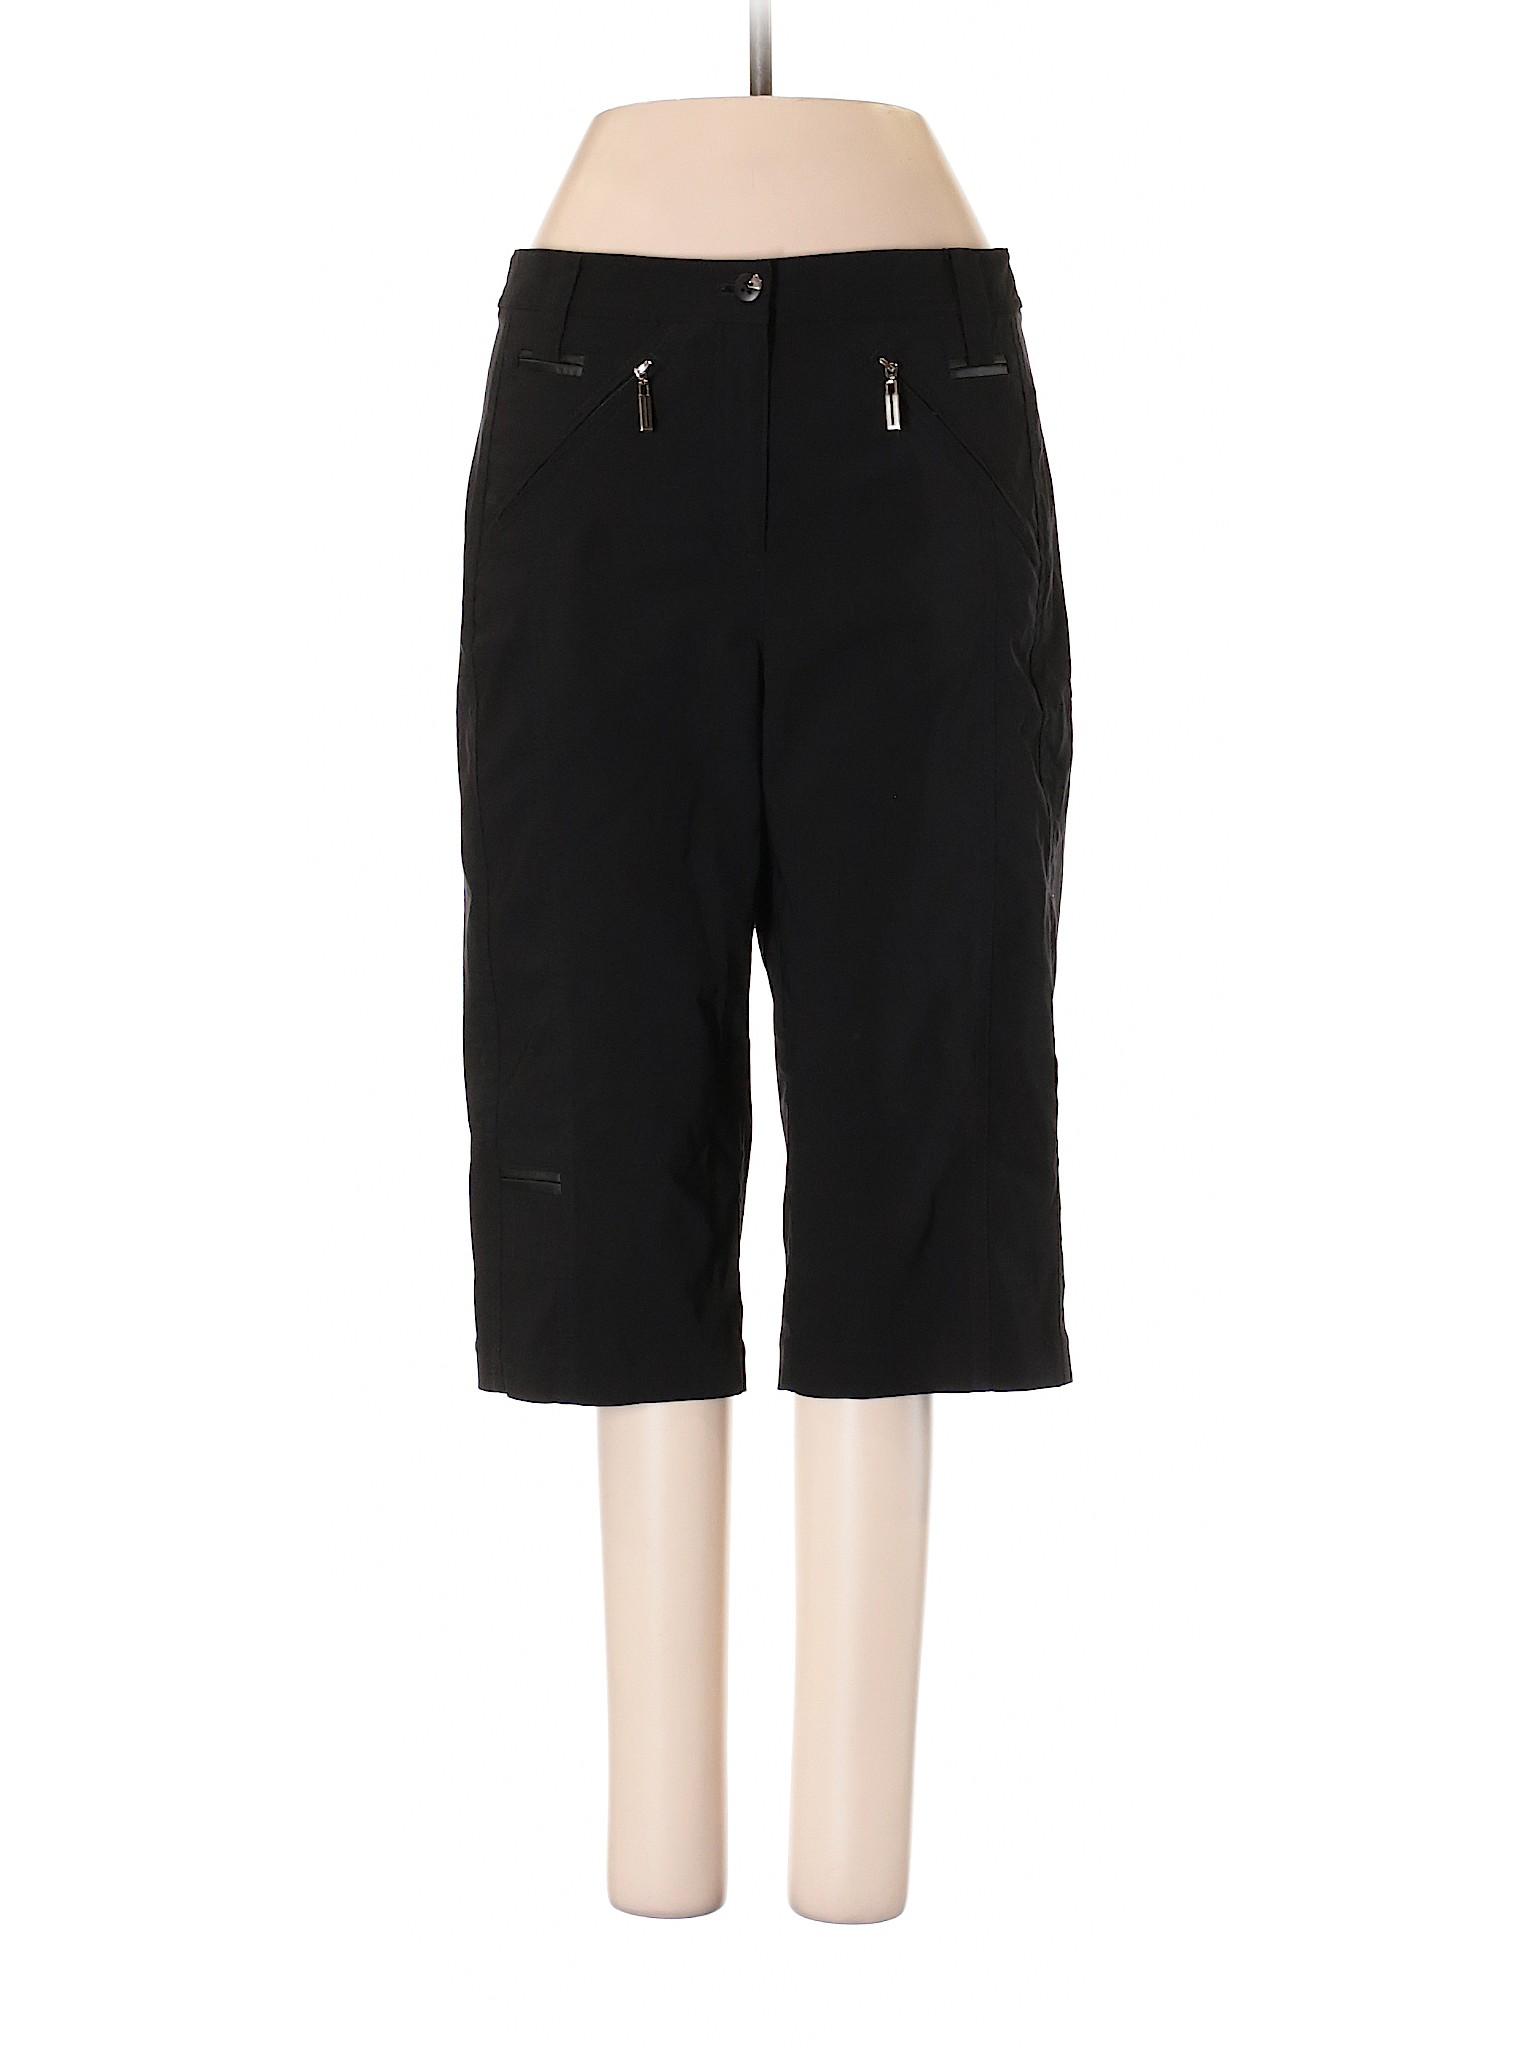 Casual leisure Pants Jamie Boutique Sadock gqX4w4x7